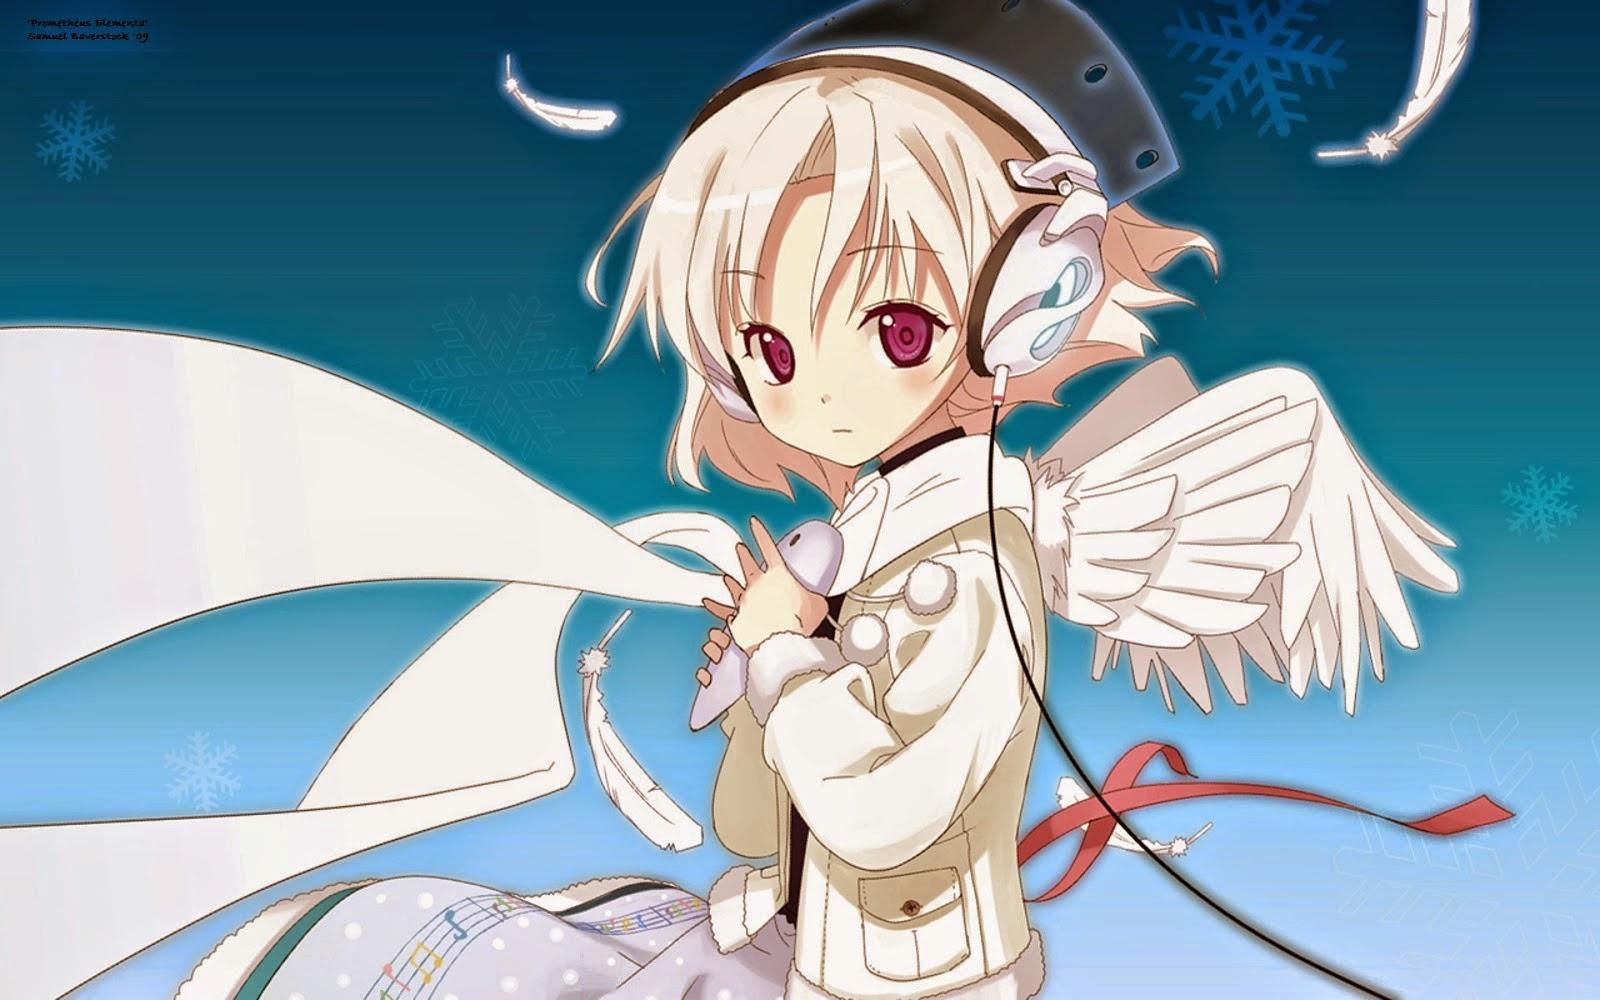 hinh-nen-anime-angel-dep-may-tinh-full-hd-8.